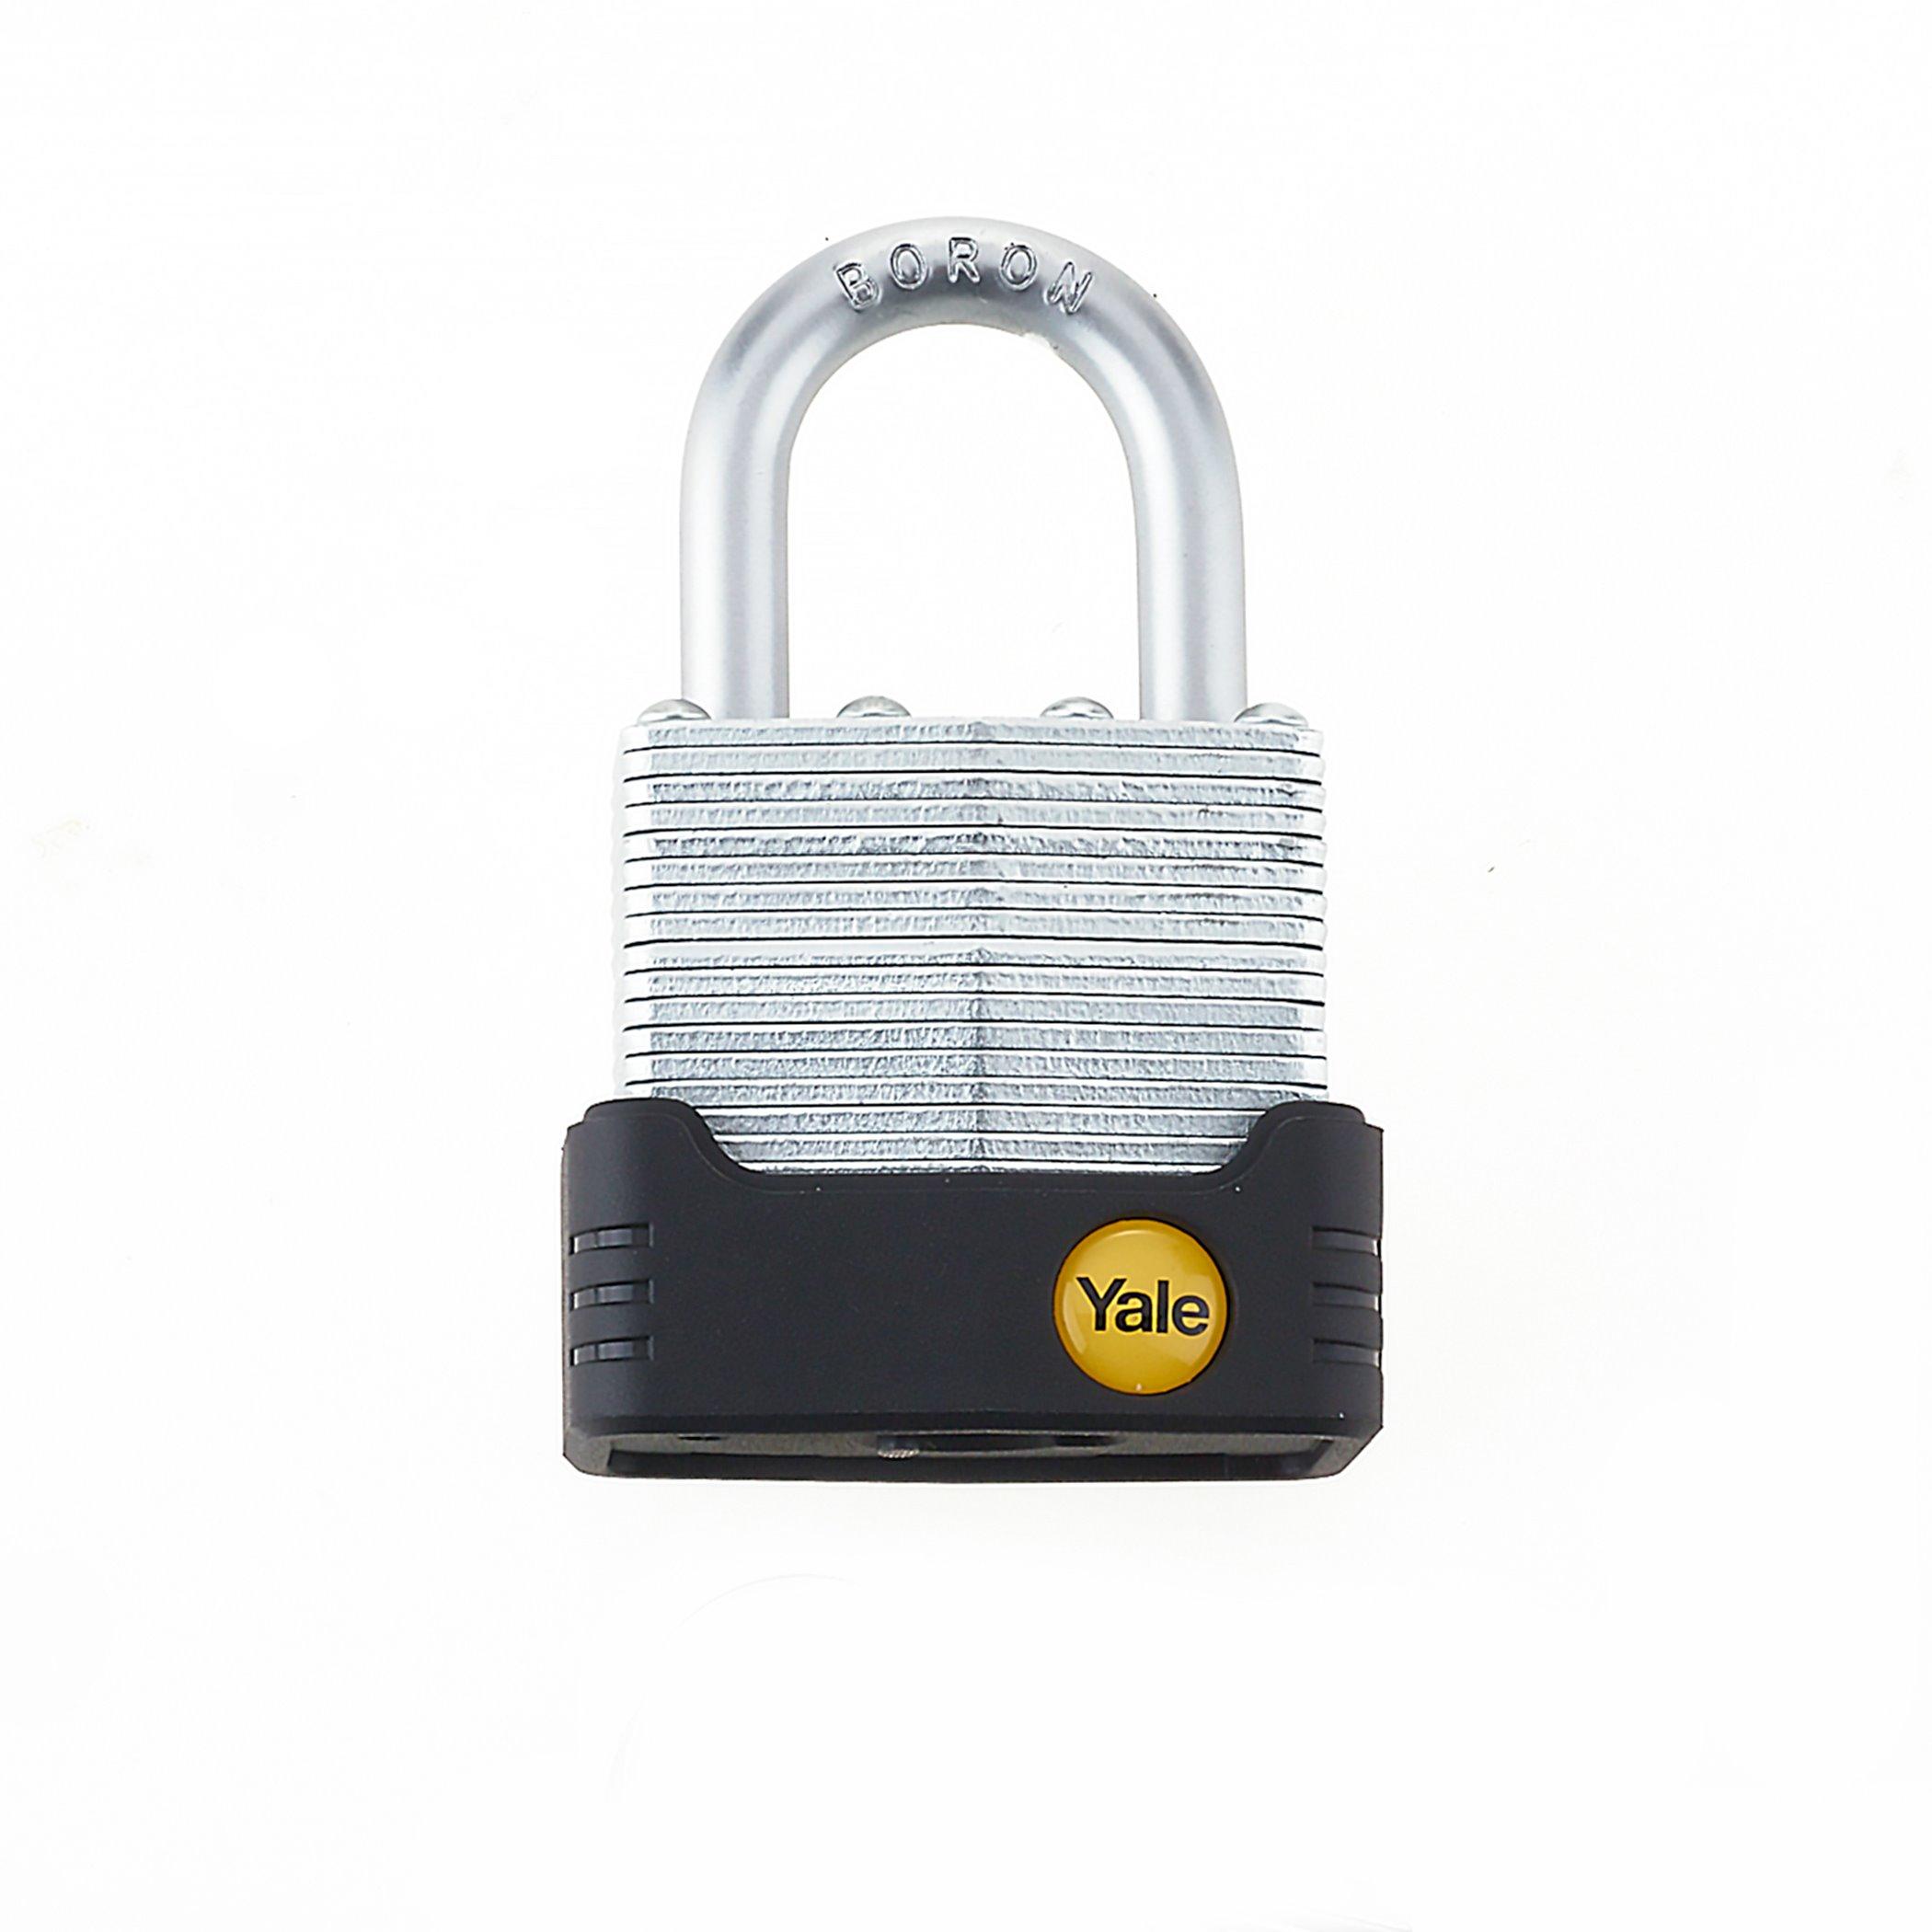 Y127 - Yale protector laminated padlocks